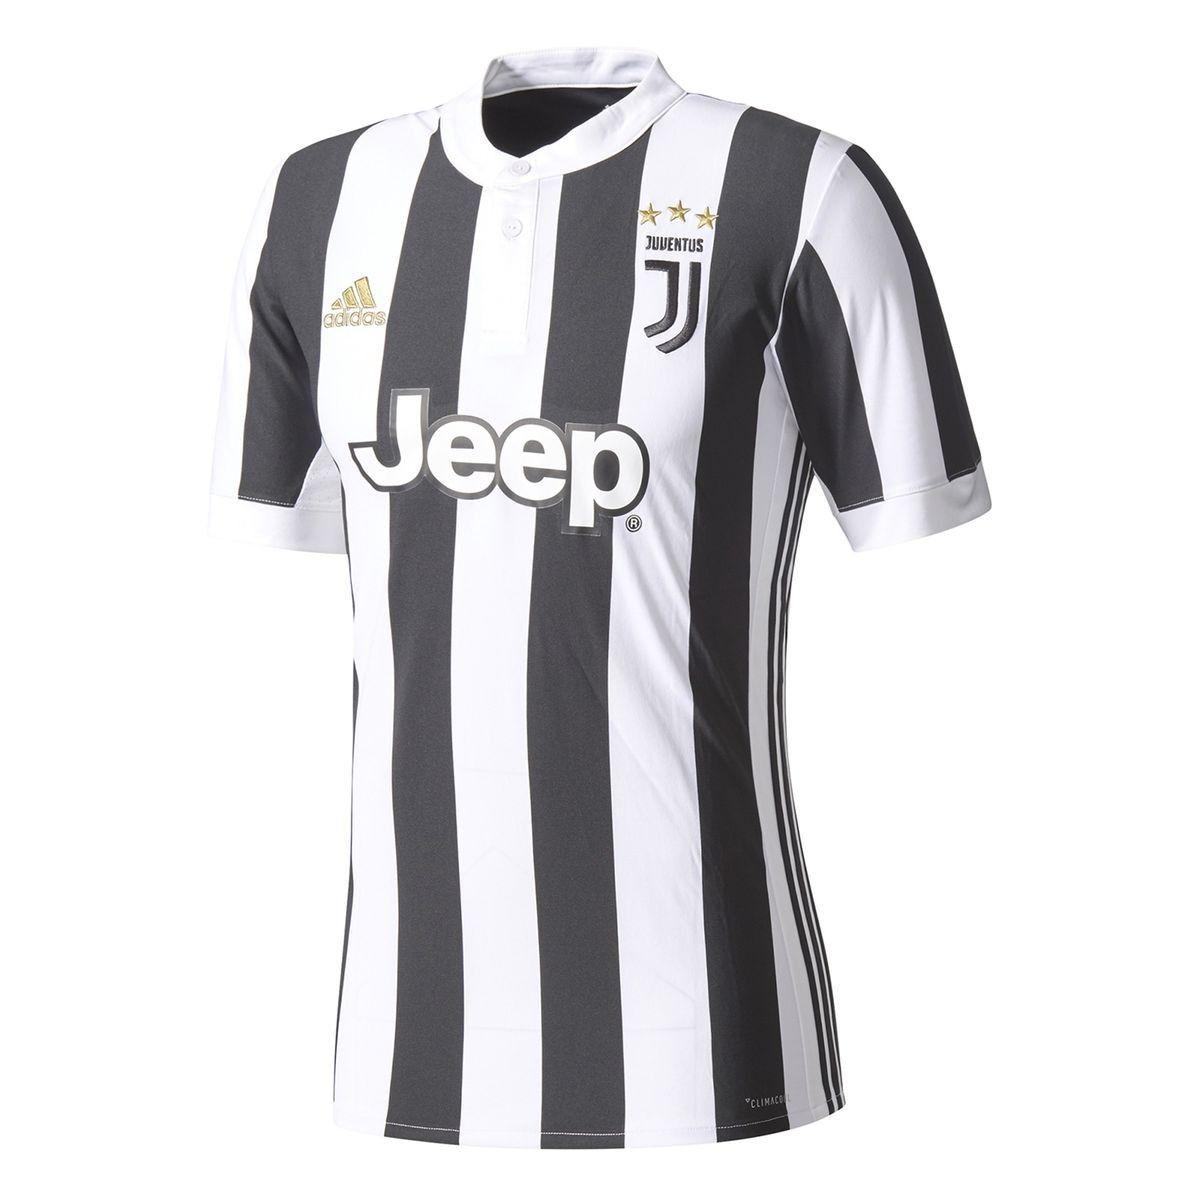 737f8ae07cf Juventus 18-19 Home Kit Design + Shorts + Socks Leaked - Footy Headlines